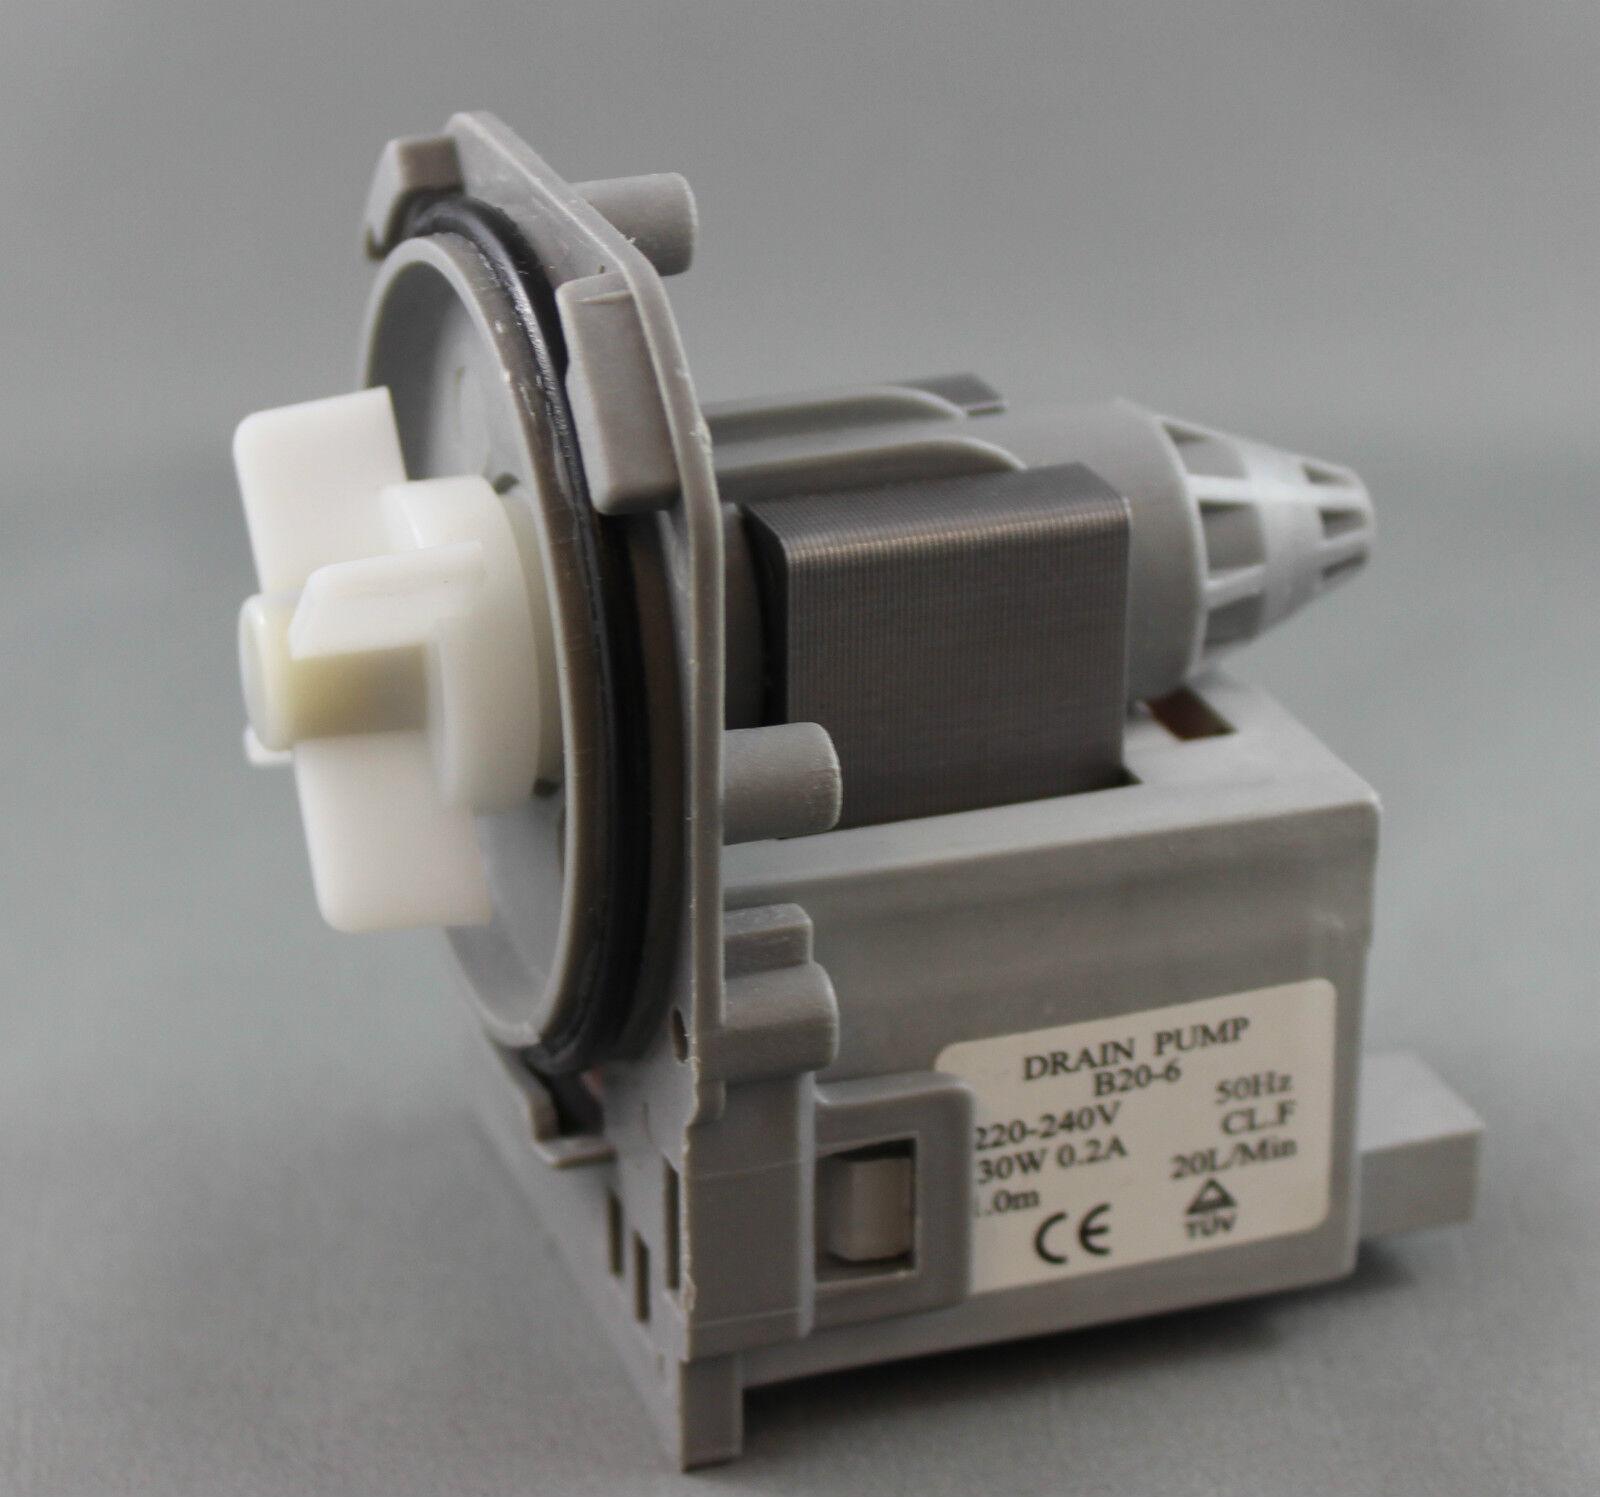 Genuine Electrolux Washing Machine Drain Pump EWF1083 EWF1074 EWF12821 type M144